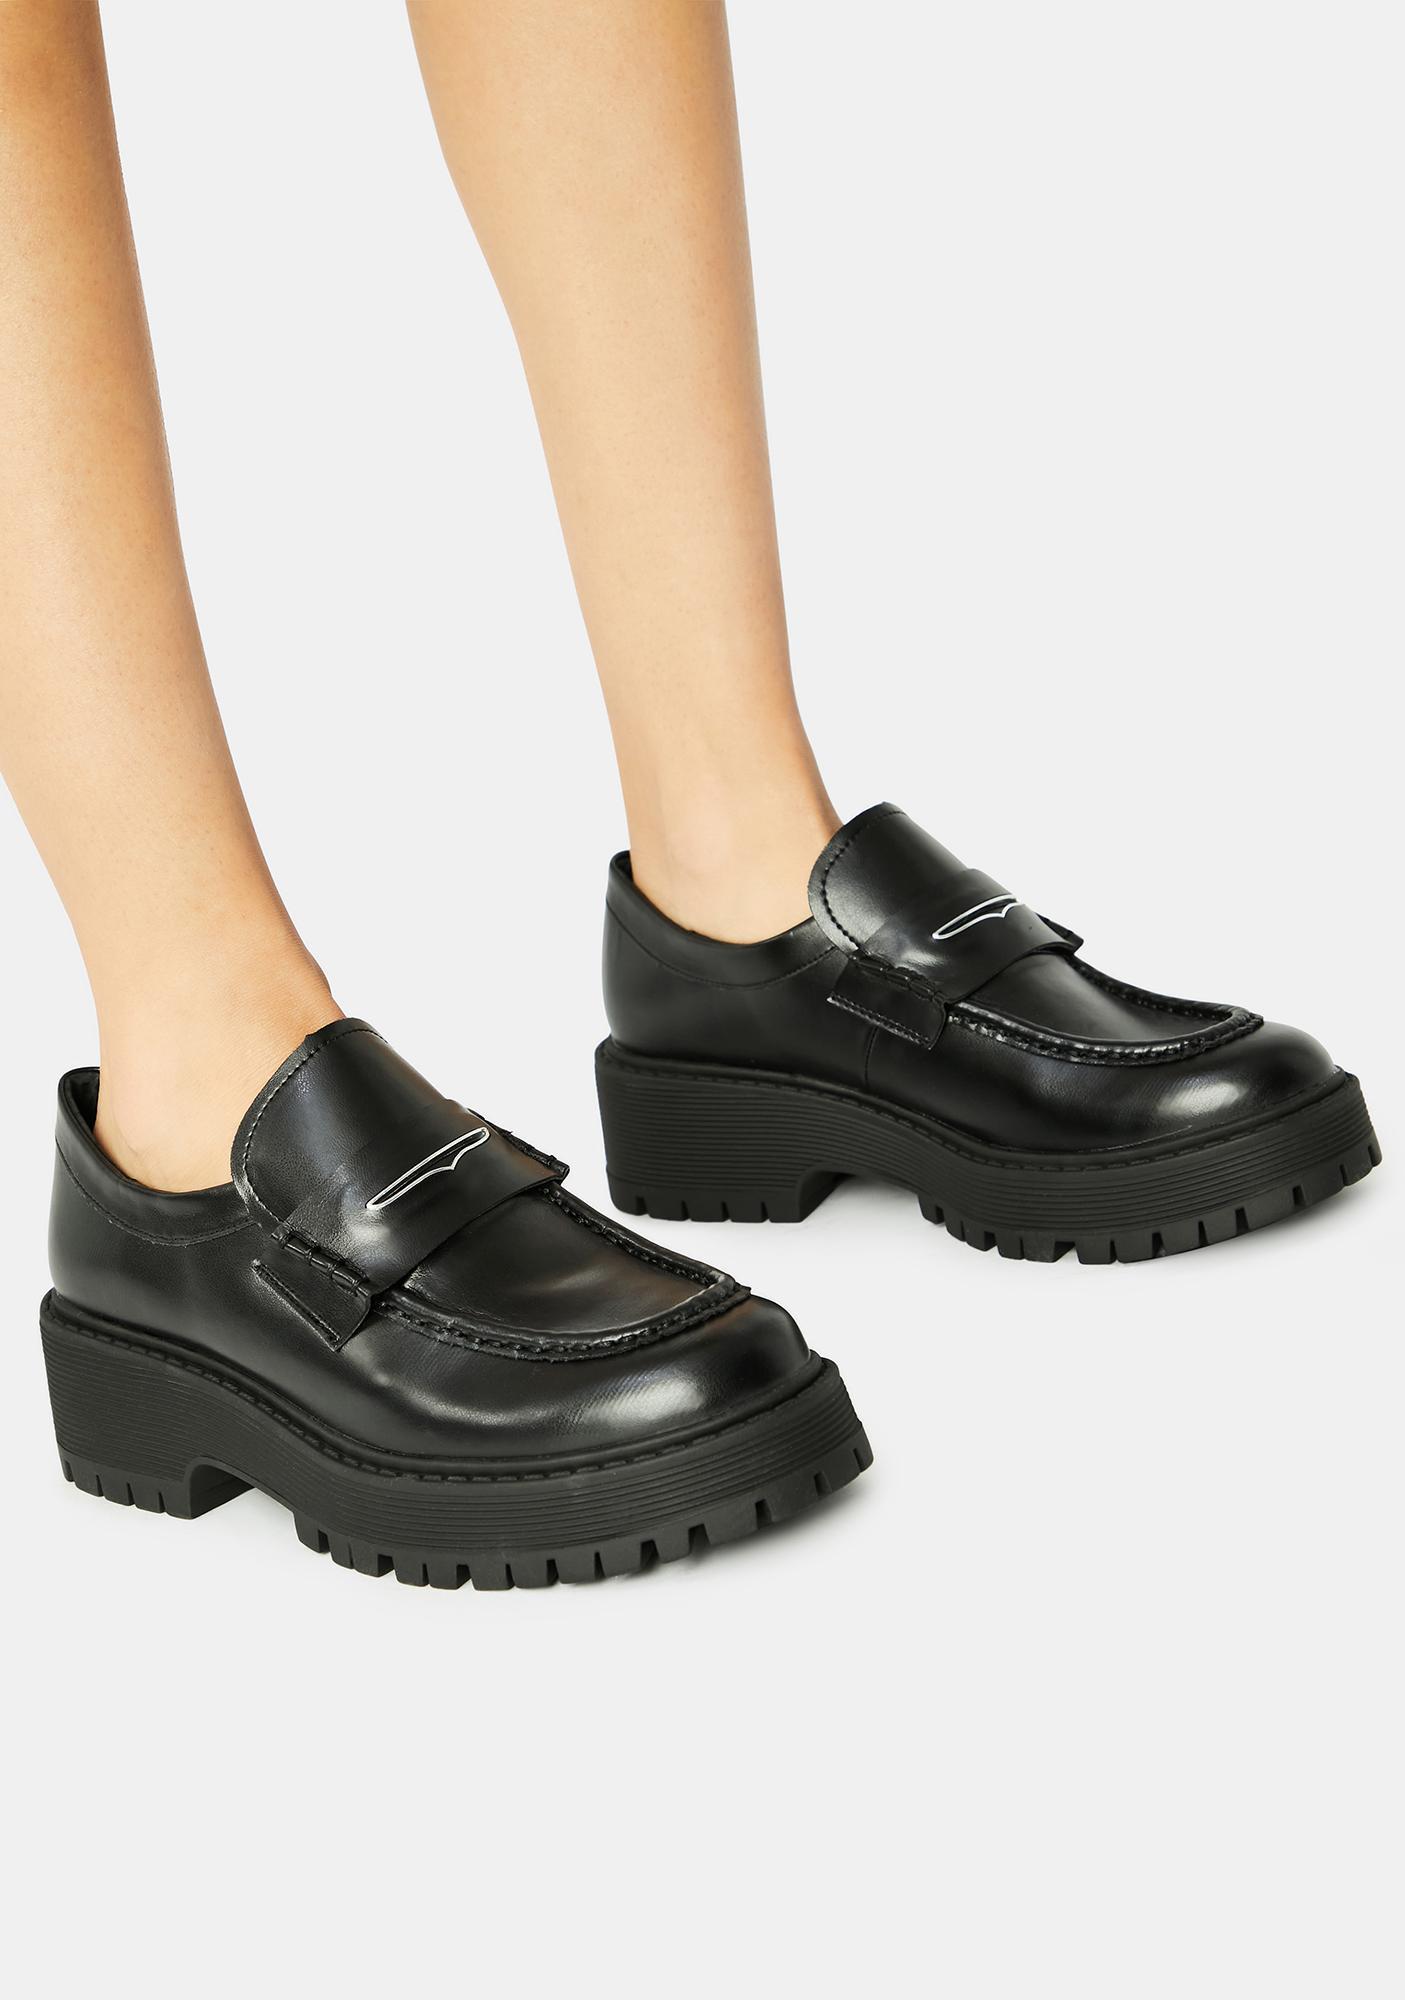 Steve Madden Black Malvern Loafers